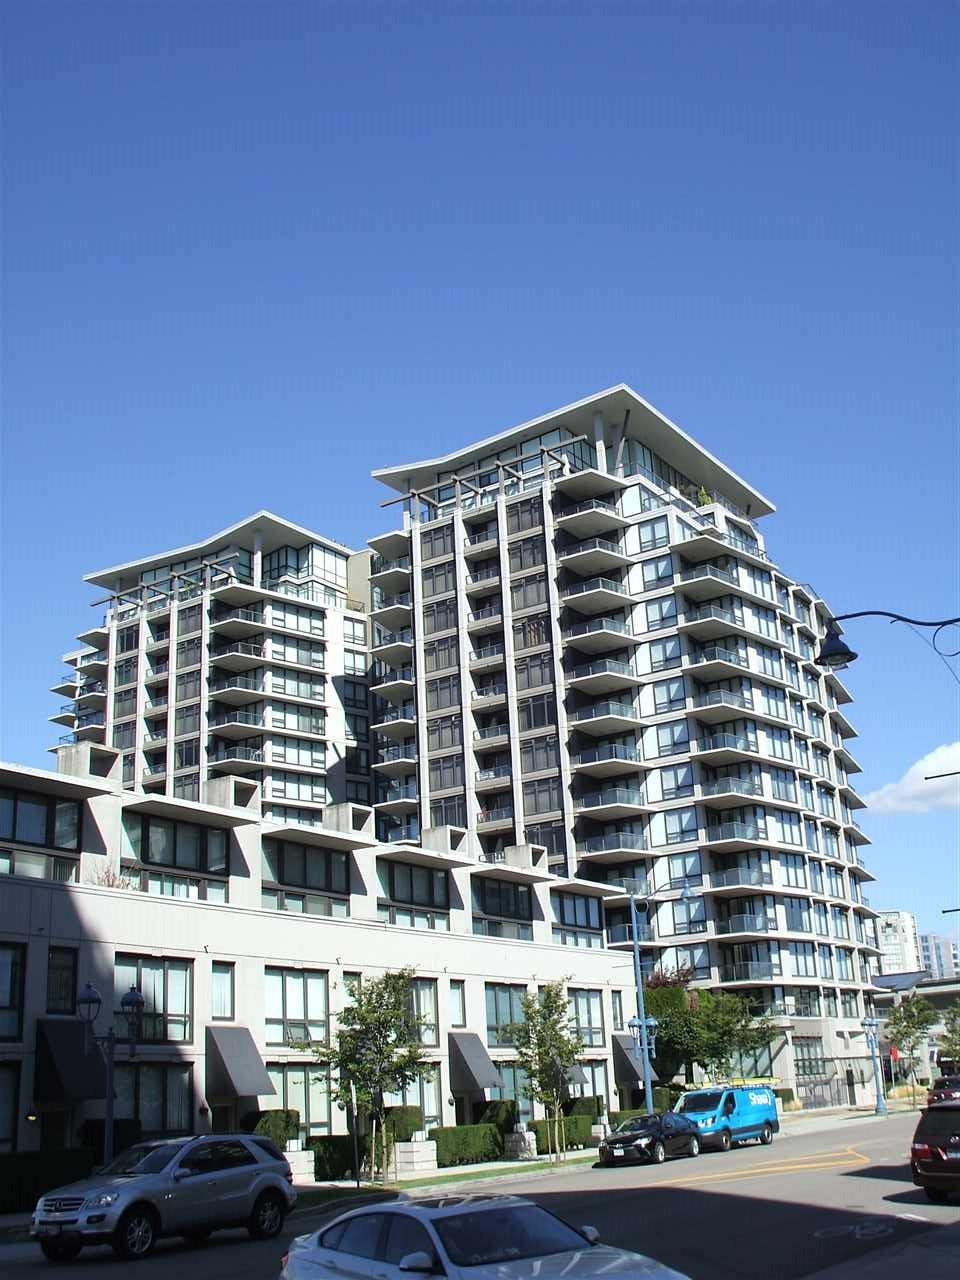 Condo Apartment at 1208 5811 NO 3 ROAD, Unit 1208, Richmond, British Columbia. Image 1